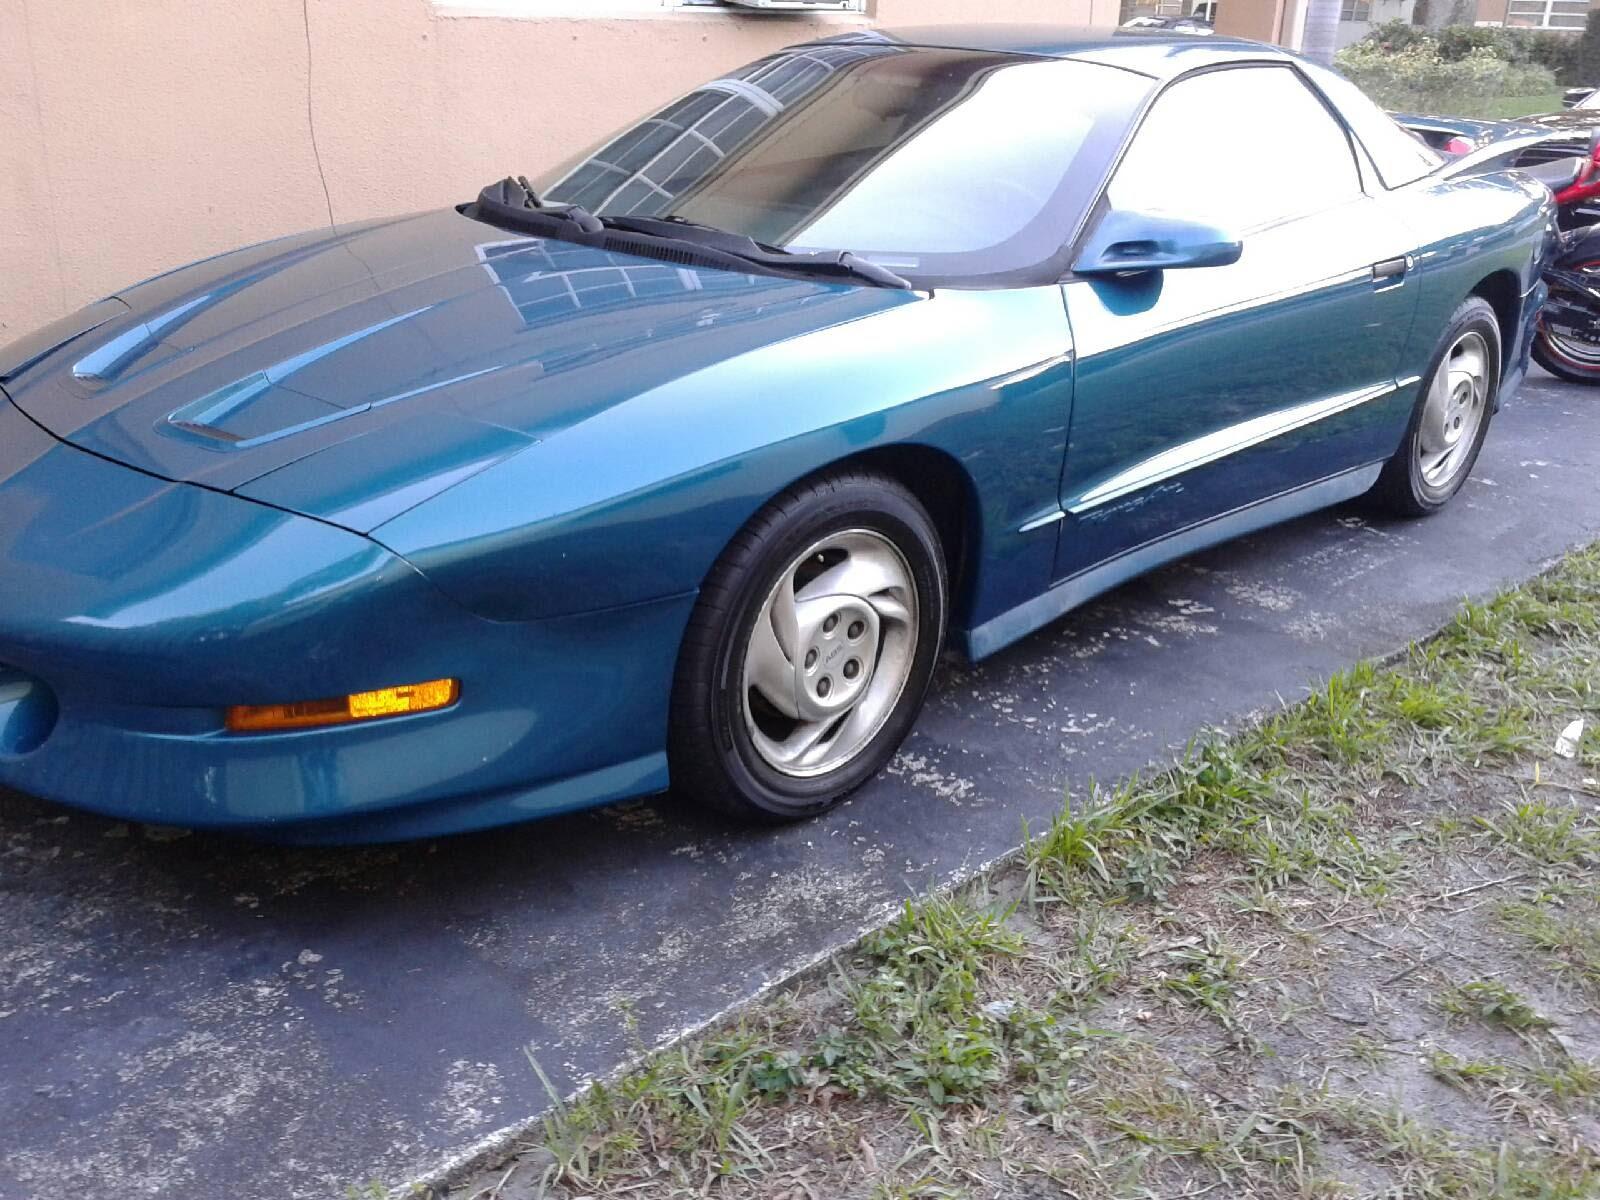 Used Pontiac Trans Am For Sale - CarGurus